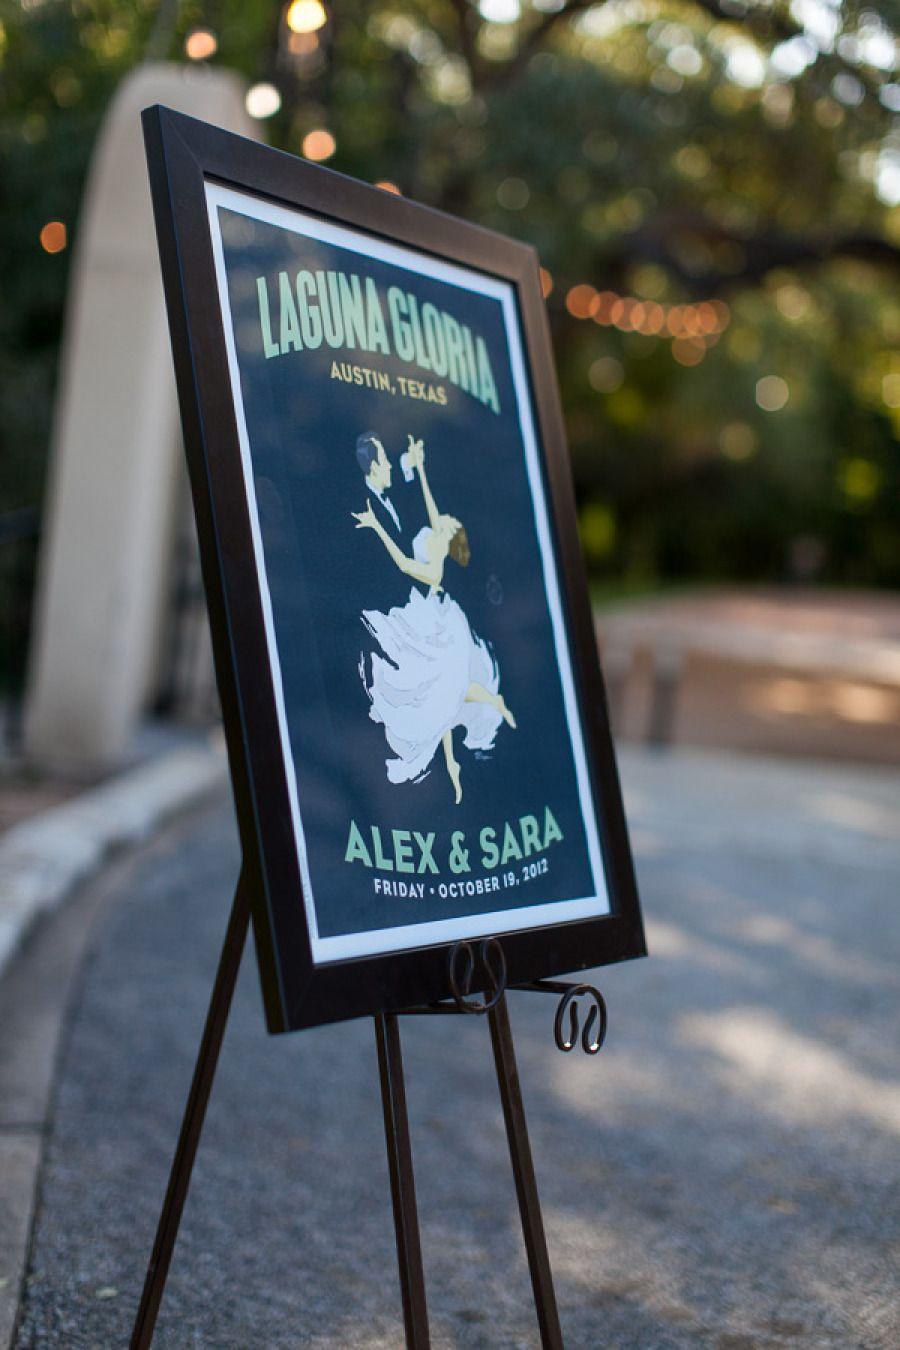 Austin wedding at laguna gloria from brett buchanan